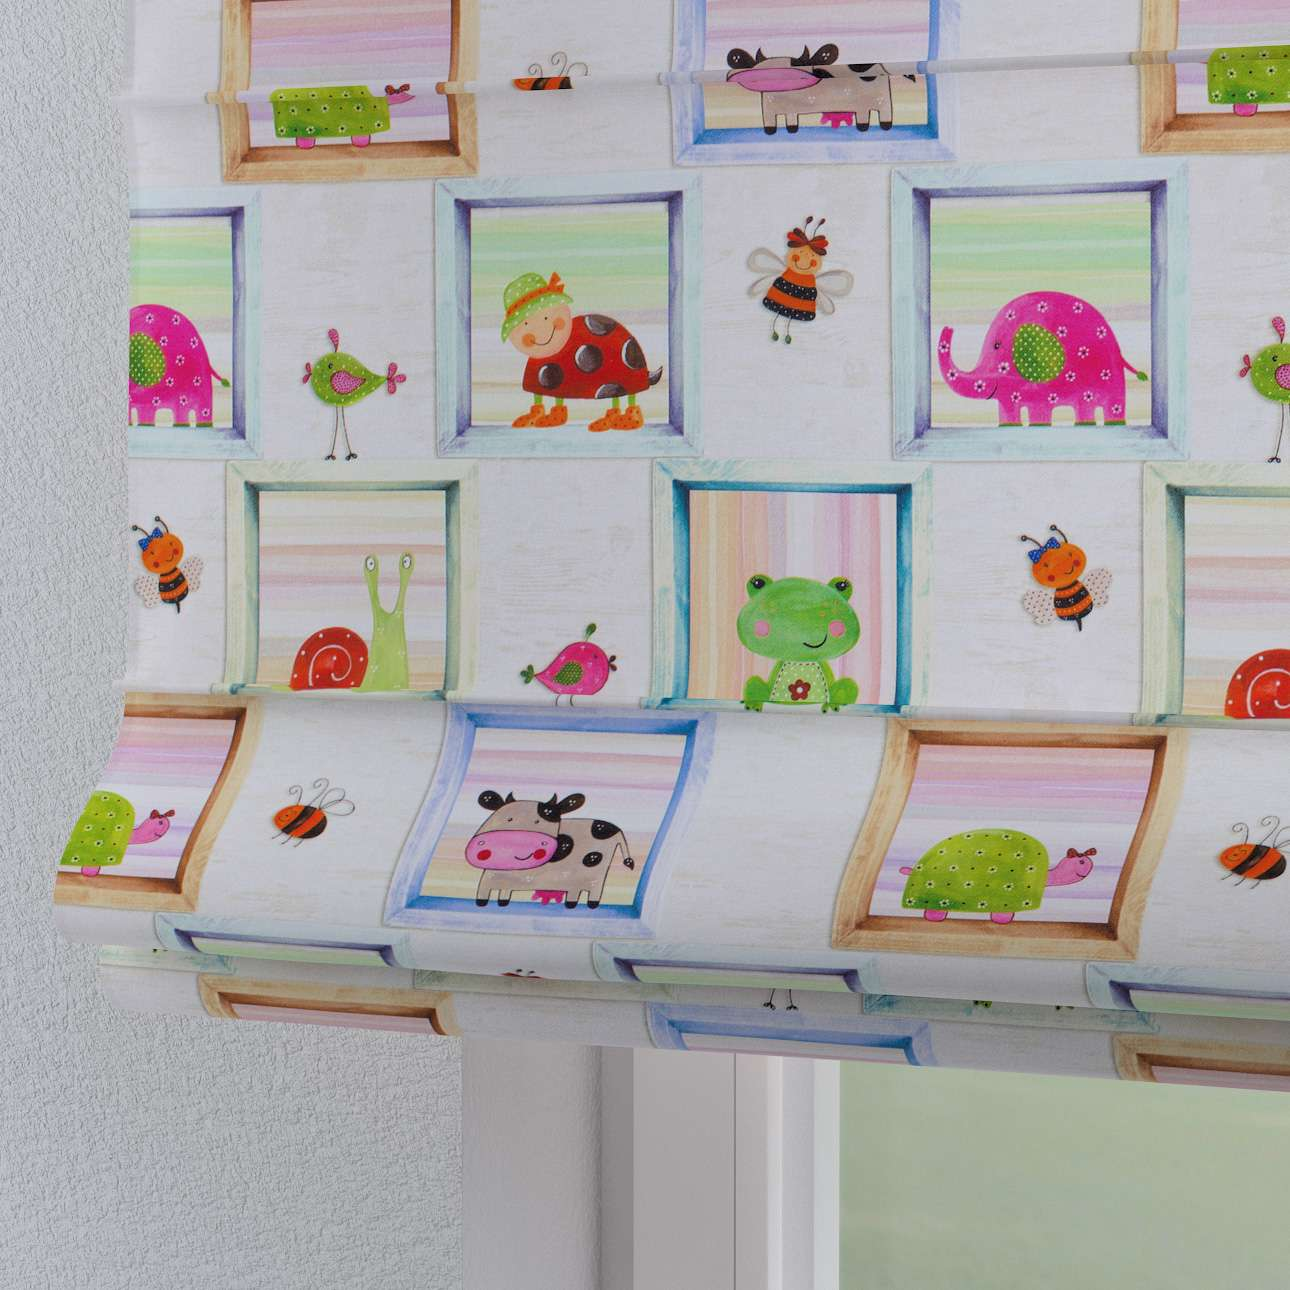 Little World 151-04 V kolekcii Little World, tkanina: 151-04